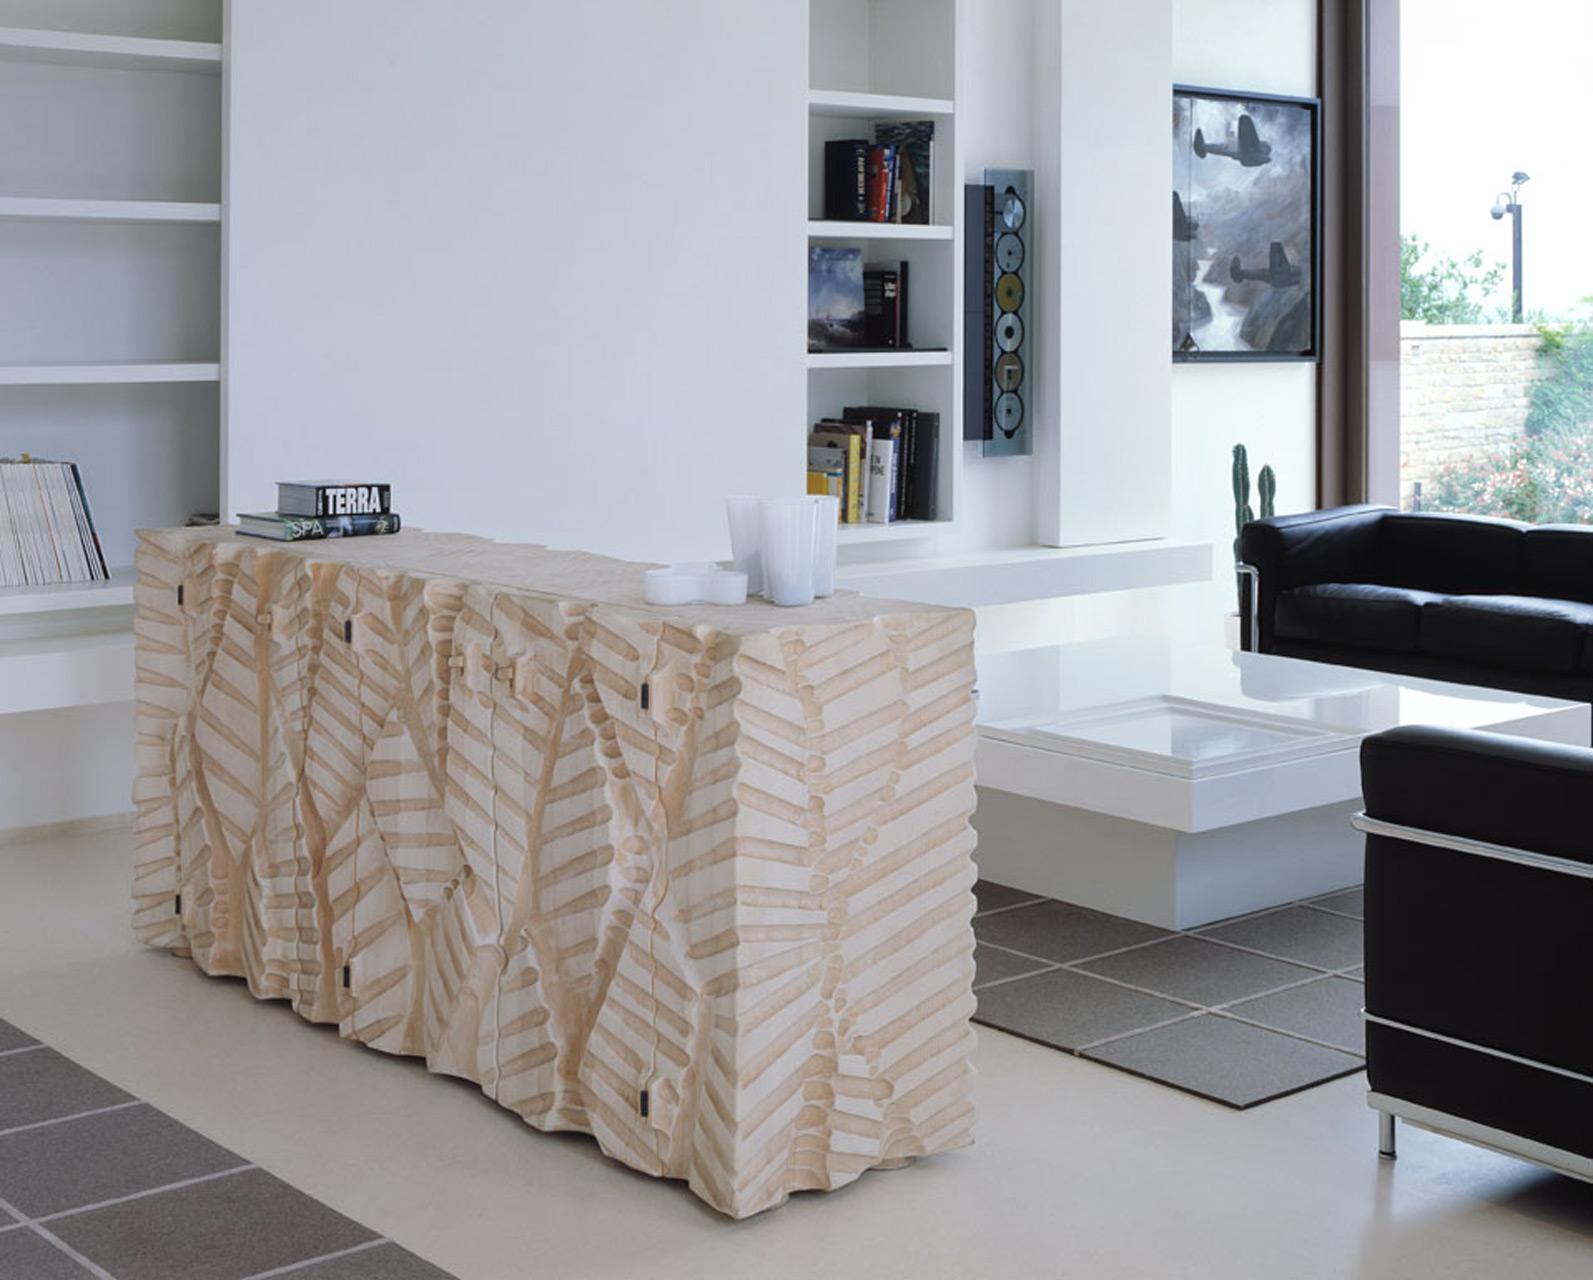 Dolmen cabinet in linden wood